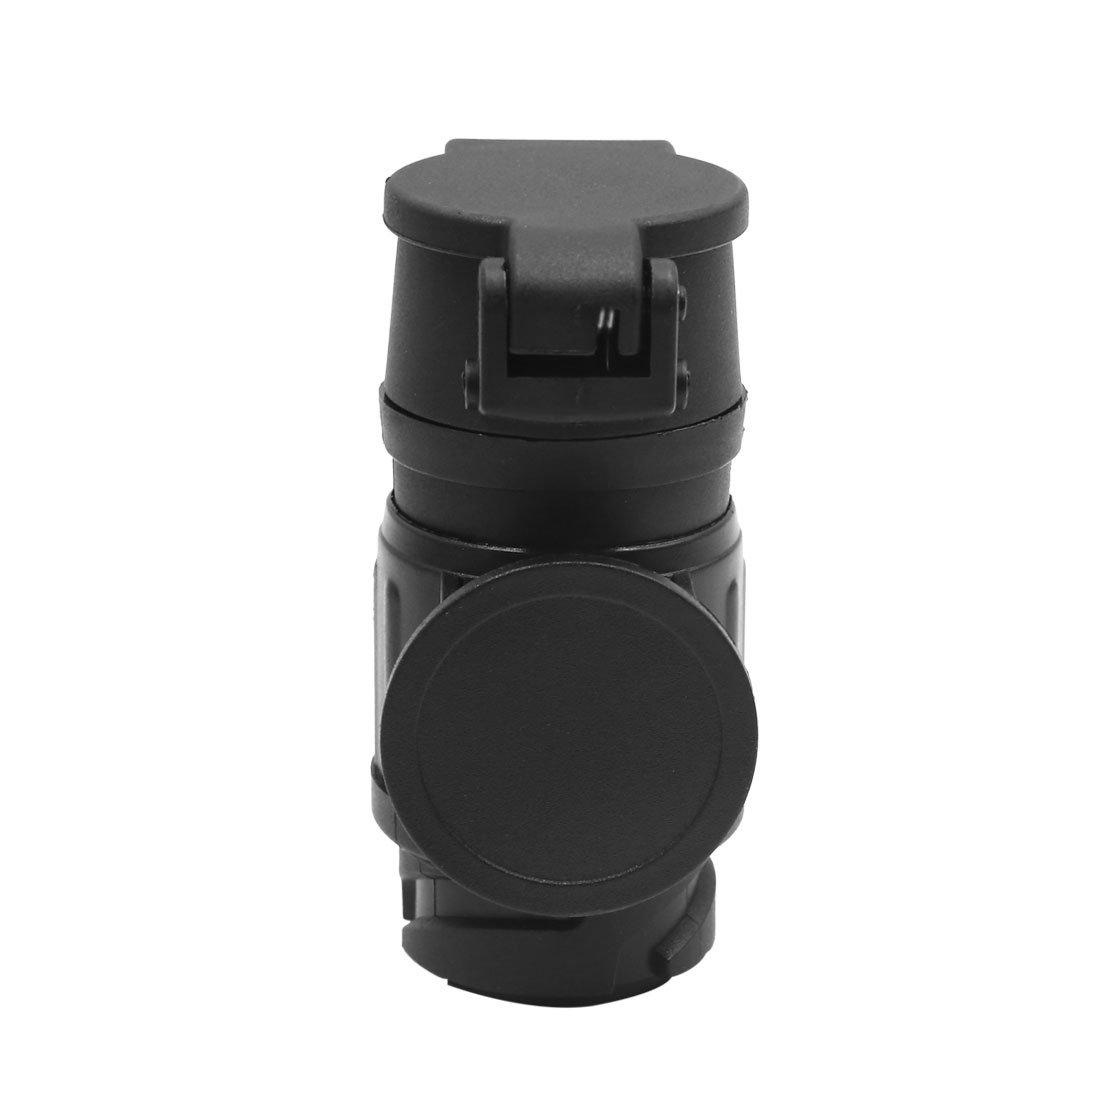 uxcell 7 Terminal Trailer Towbar Signal Light Connector Adapter Black for Auto Car